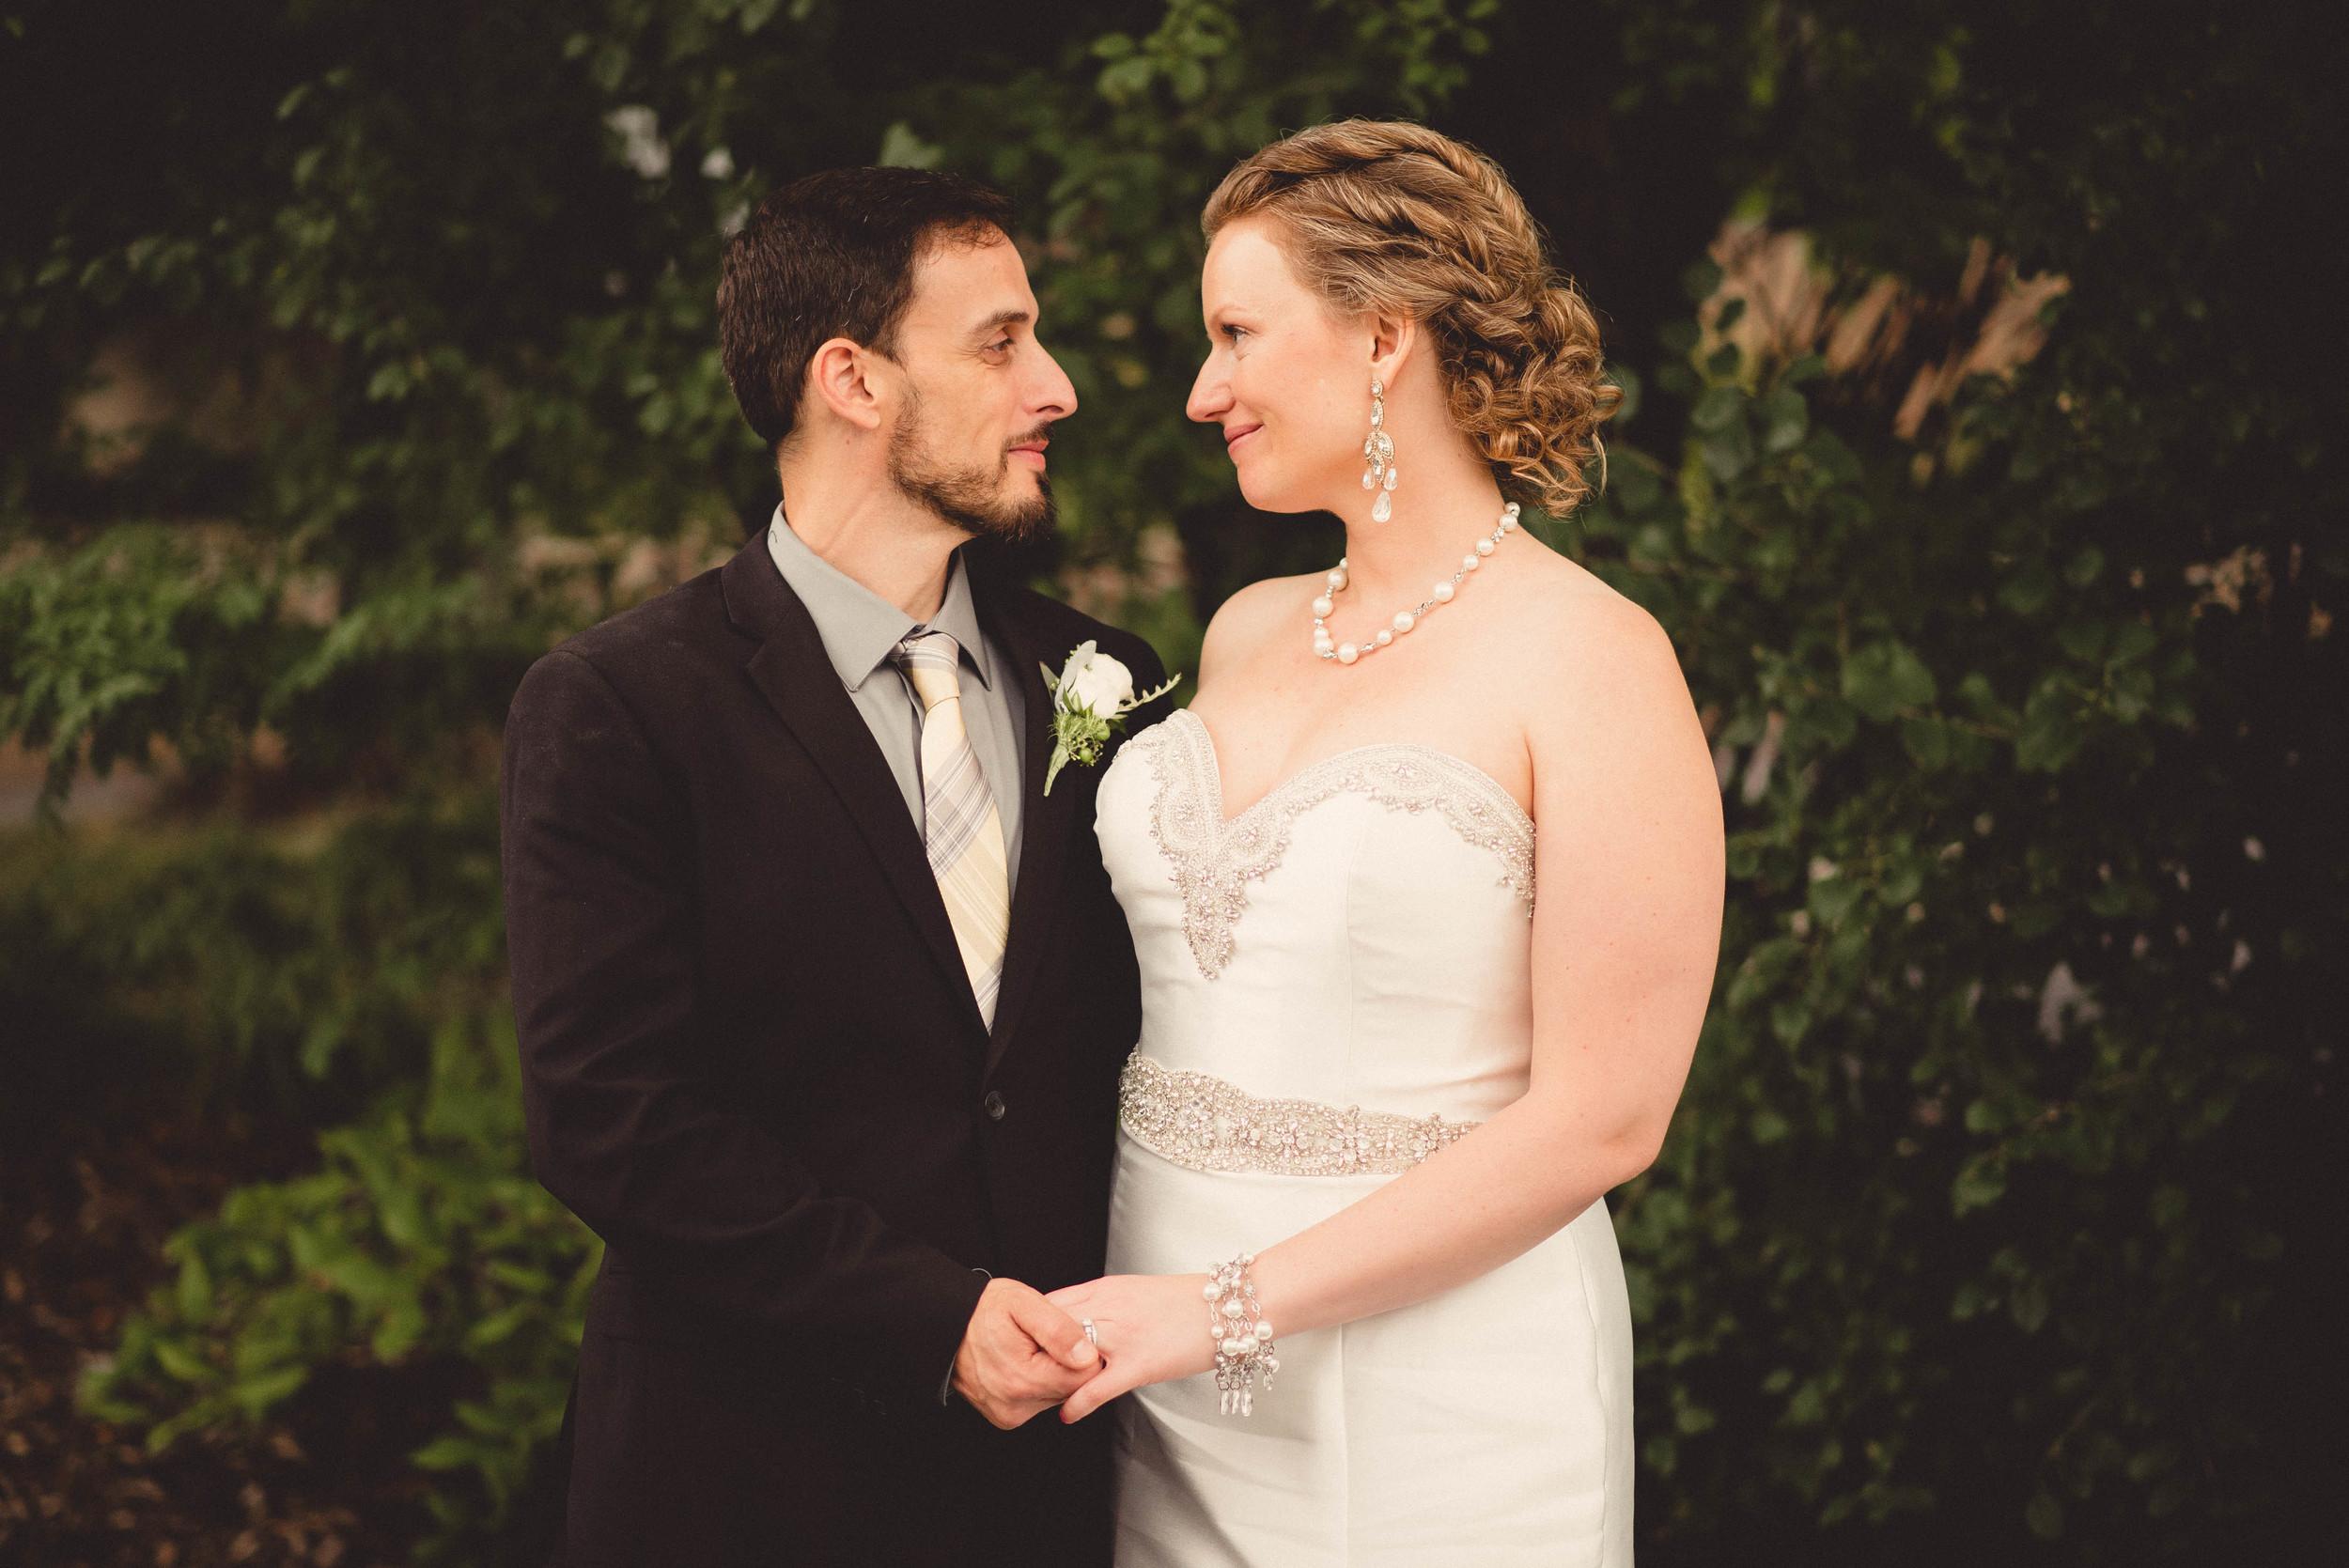 Matt and Shannon Wedding-20160730-20-45-50.JPG